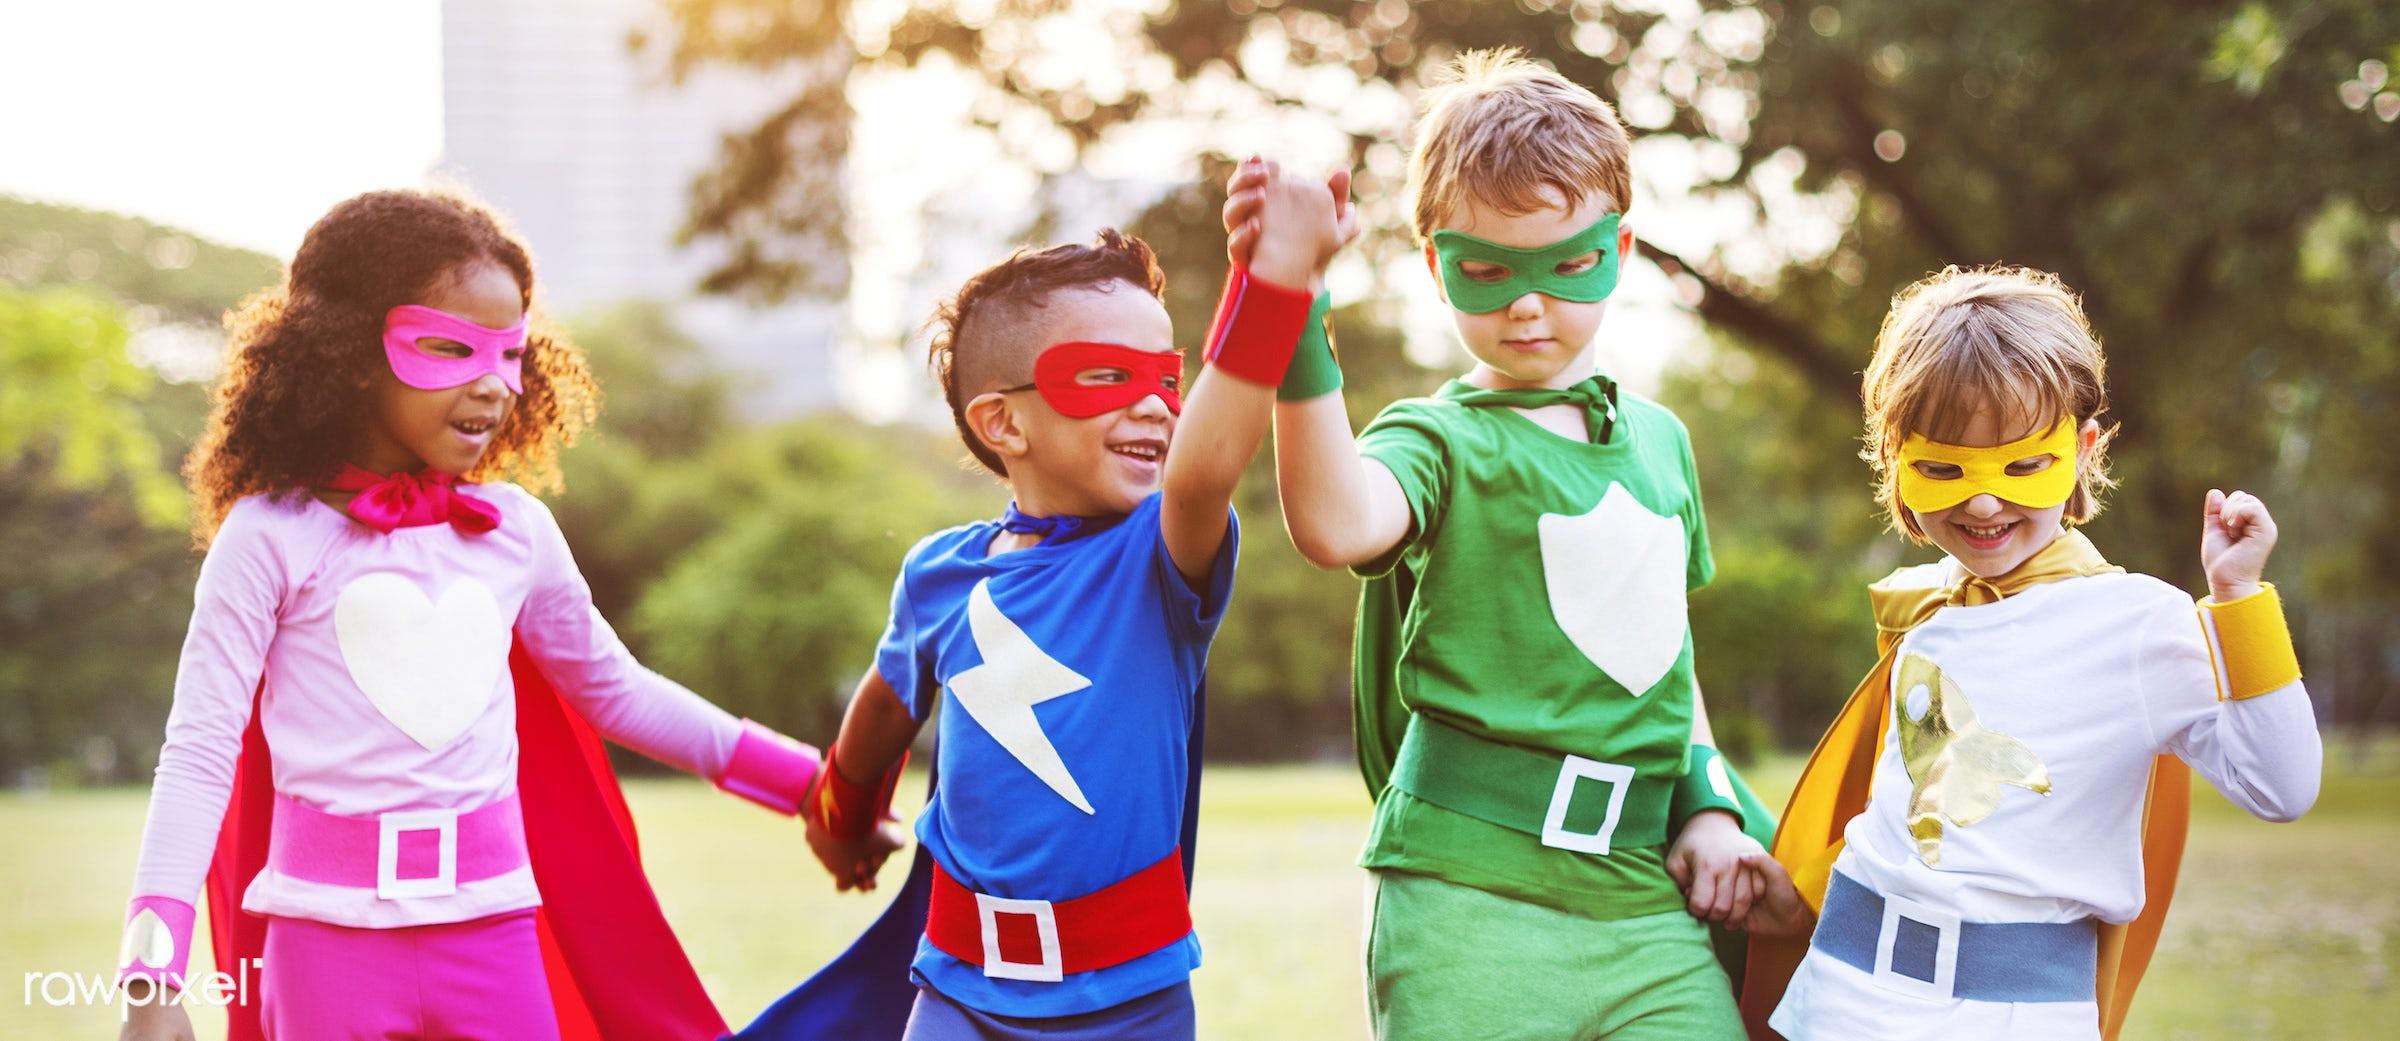 superhero, activity, african descent, asian ethnicity, aspirations, boys, brave, cheerful, child, childhood, children,...